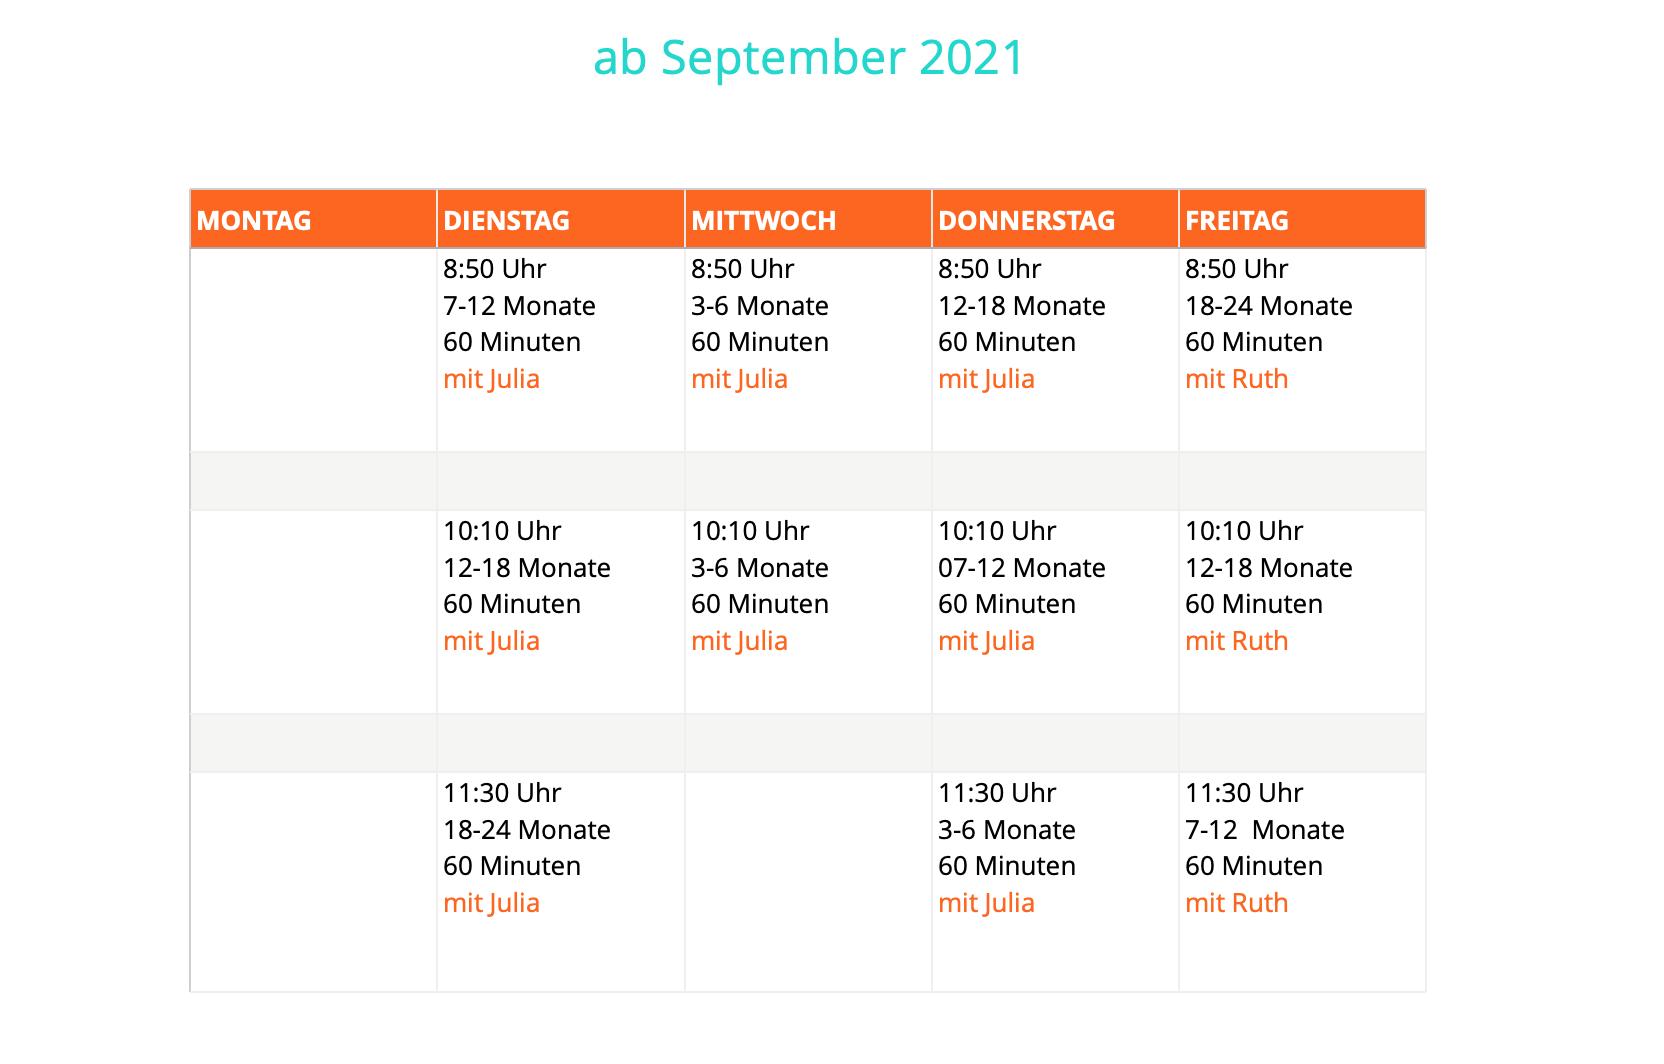 Krümelkiste Kursplanung ab September 2021